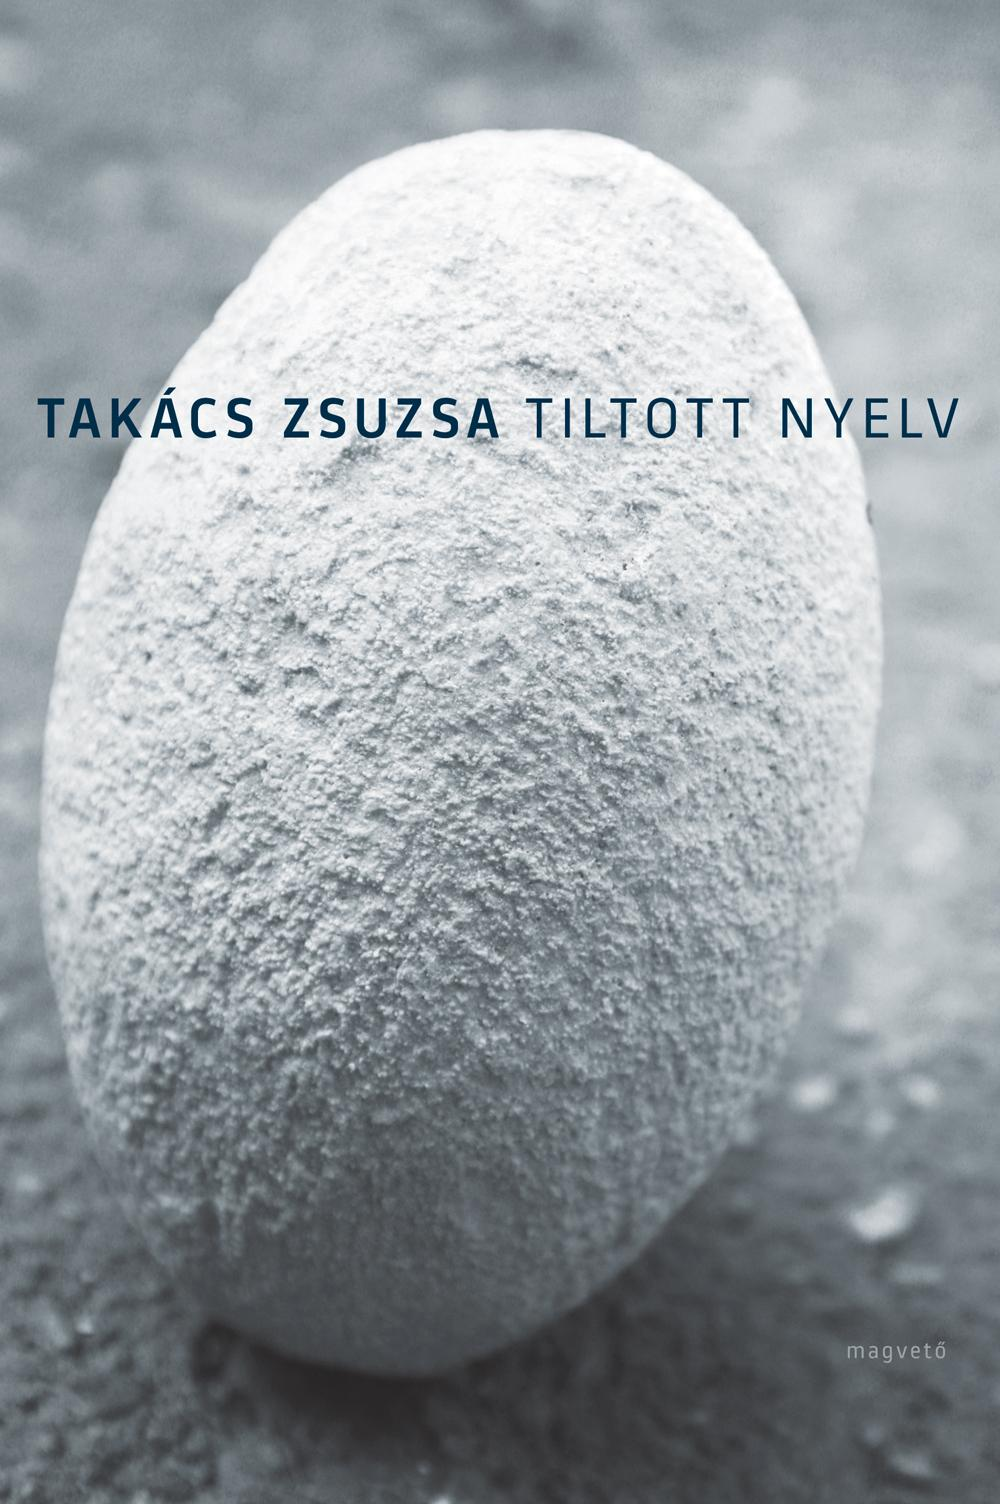 Takacs_Zsuzsa_borito